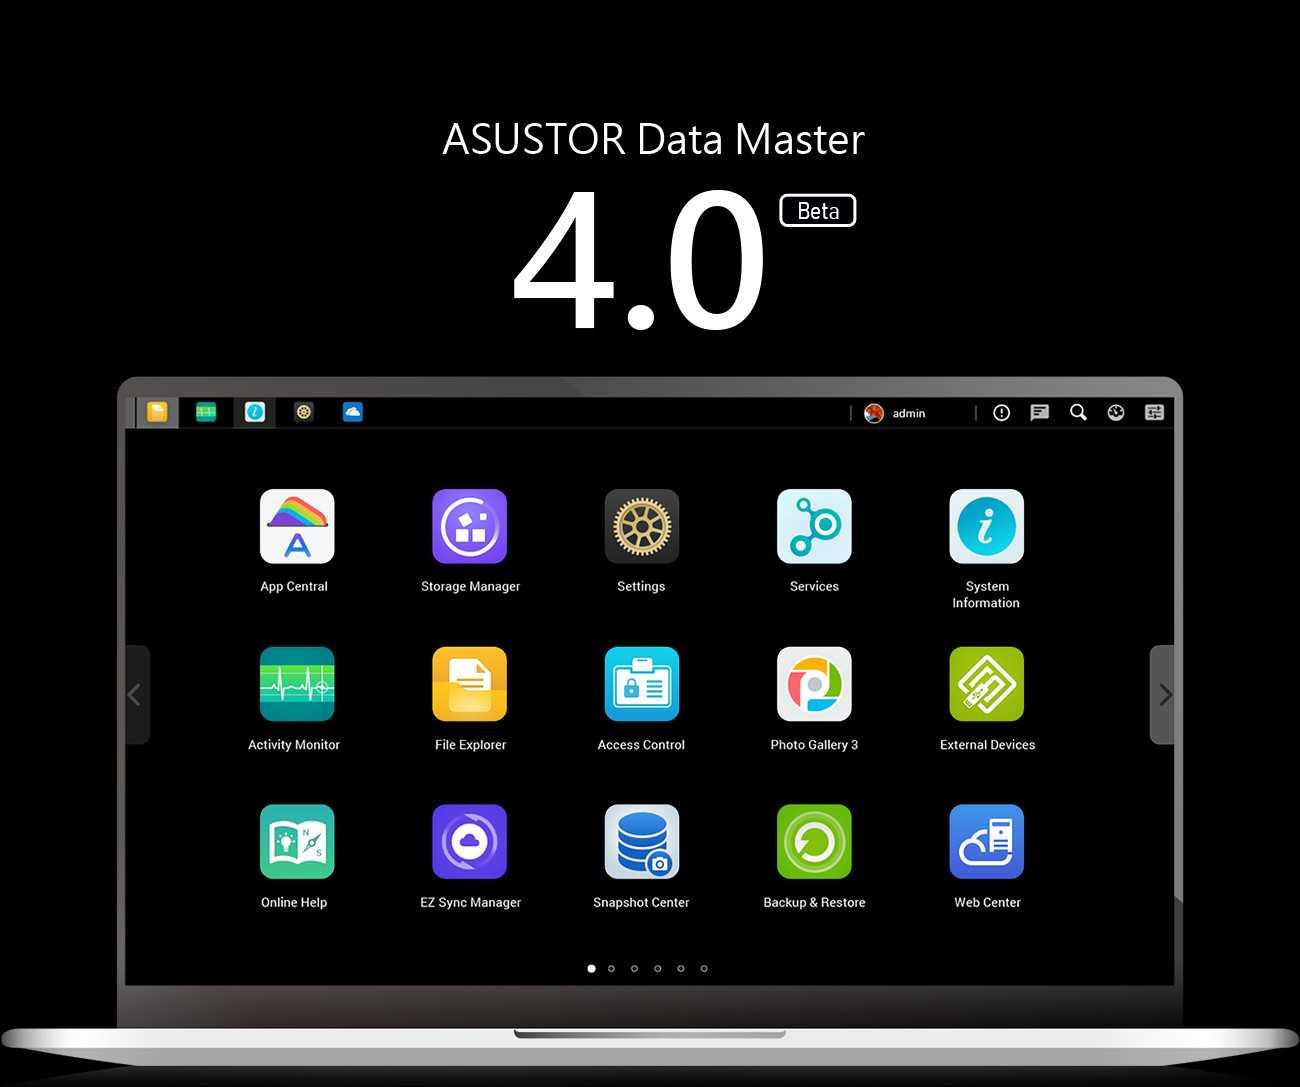 ASUSTOR: ADM 4.0 Beta announced